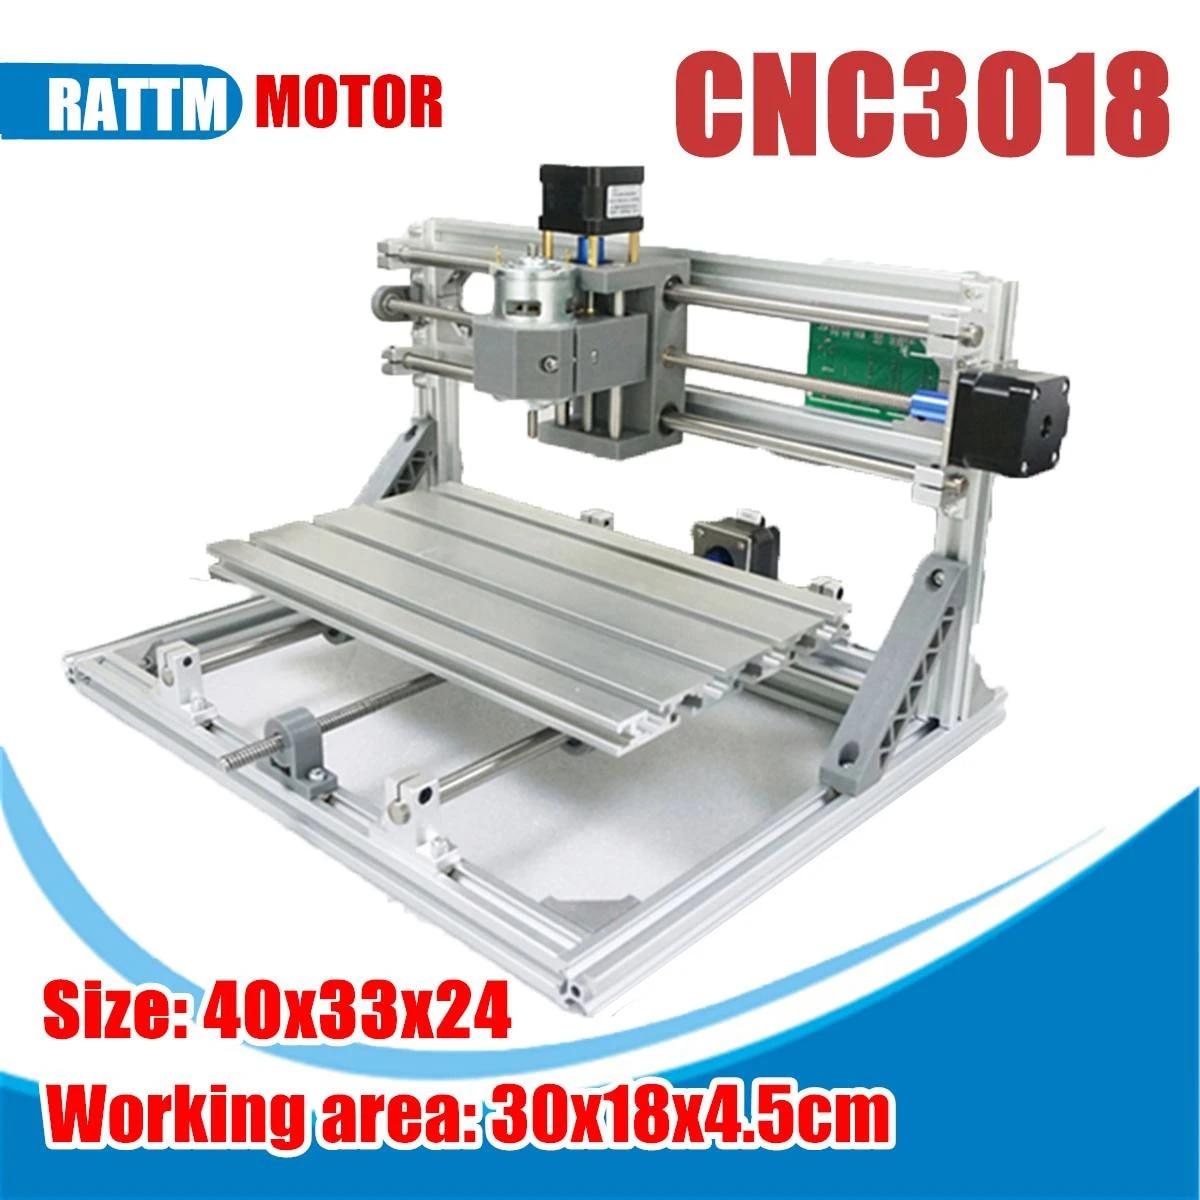 3018 3 Eksen Mini Diy Cnc Router Standart Mili Motoru Ahşap Oyma Makinesi Freze Gravür Mini Cnc Router Lazer Makinesi Ahşap Yönlendiriciler Aliexpress